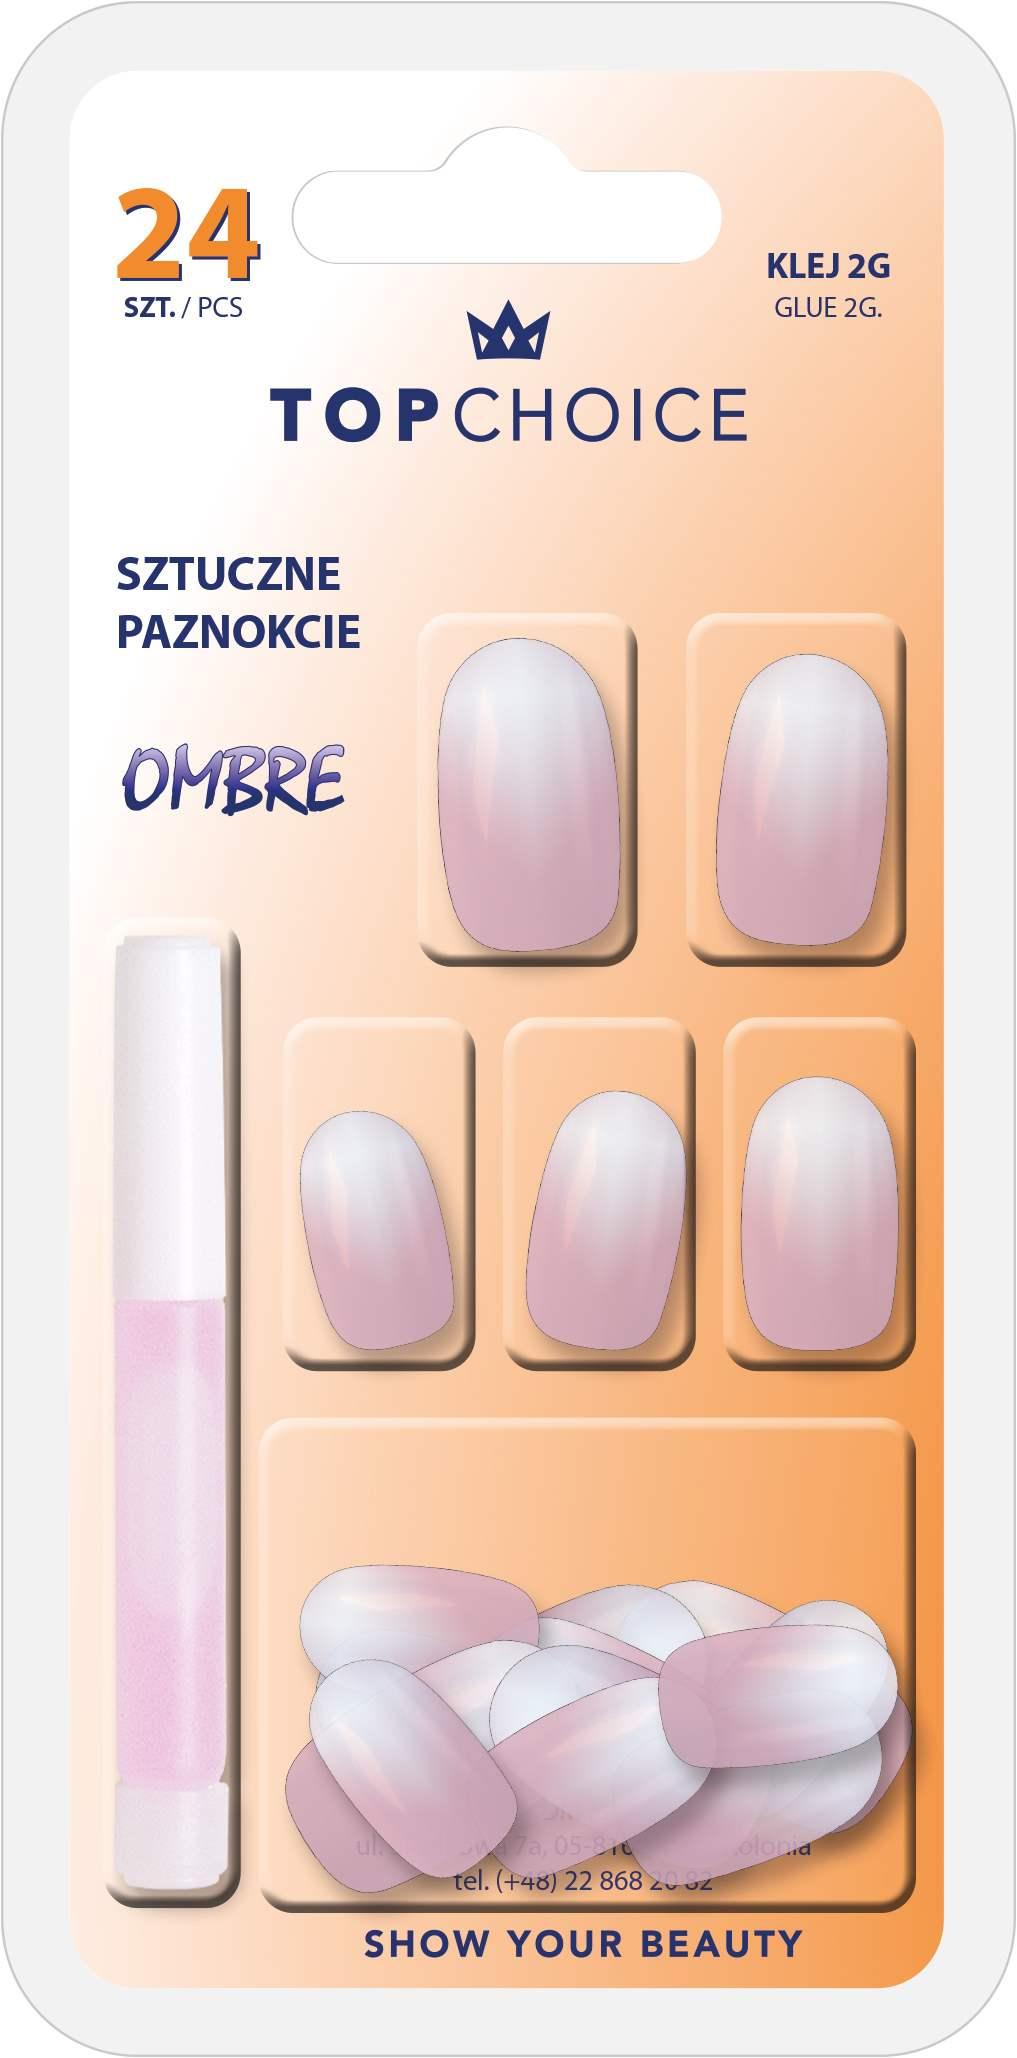 Top Choice Umele Nalepovaci Nehty Ombre 24ks 2g Pink Lepidlo 78019